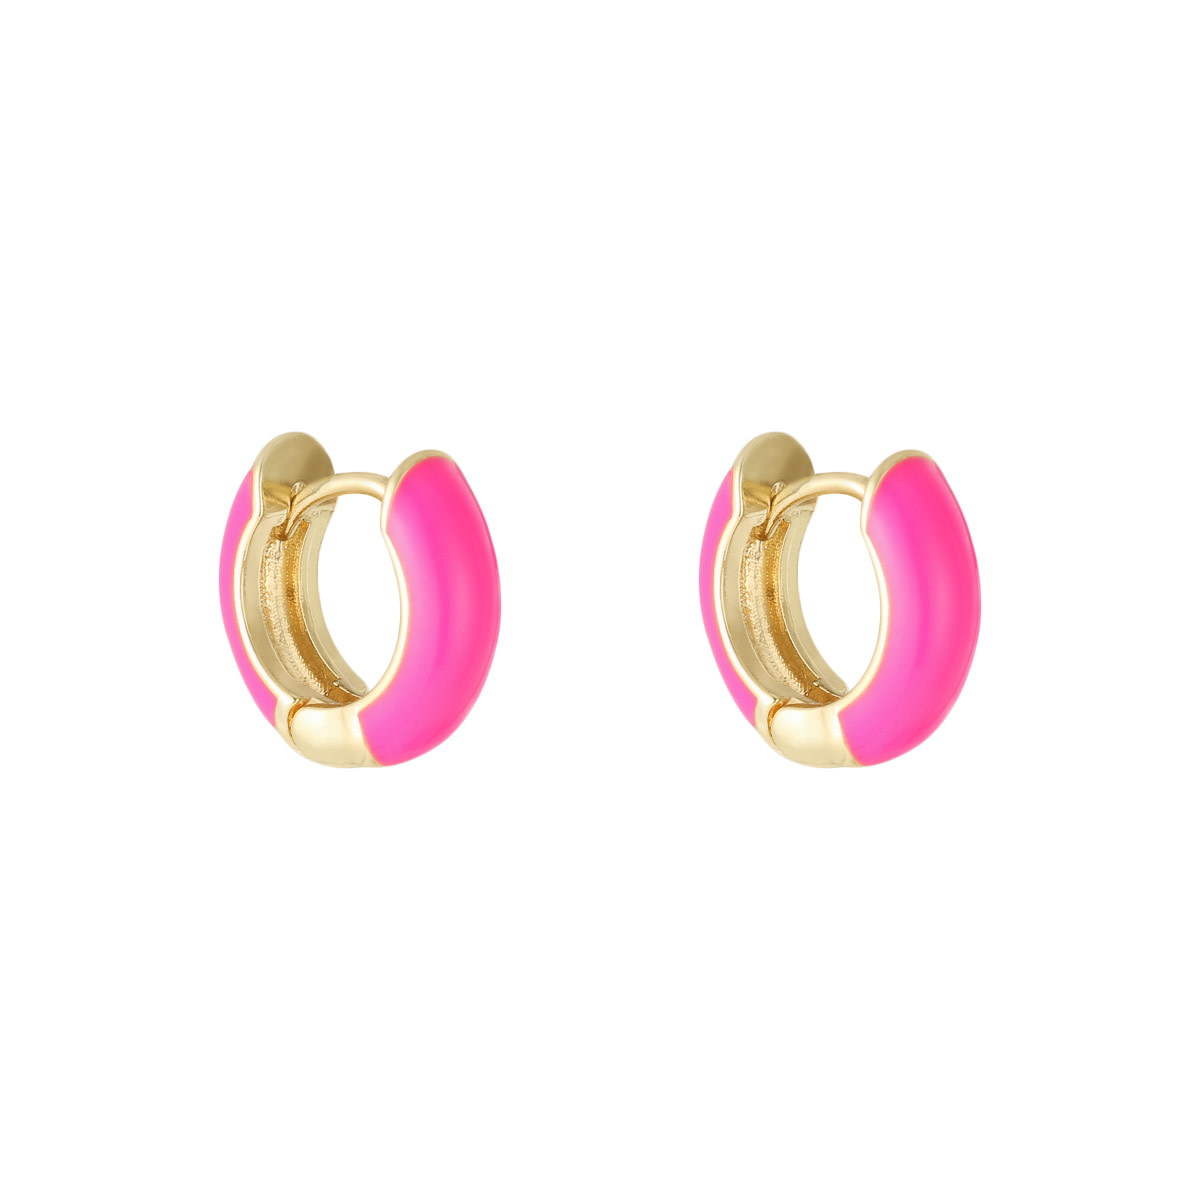 With love Earrings happy color - fushia